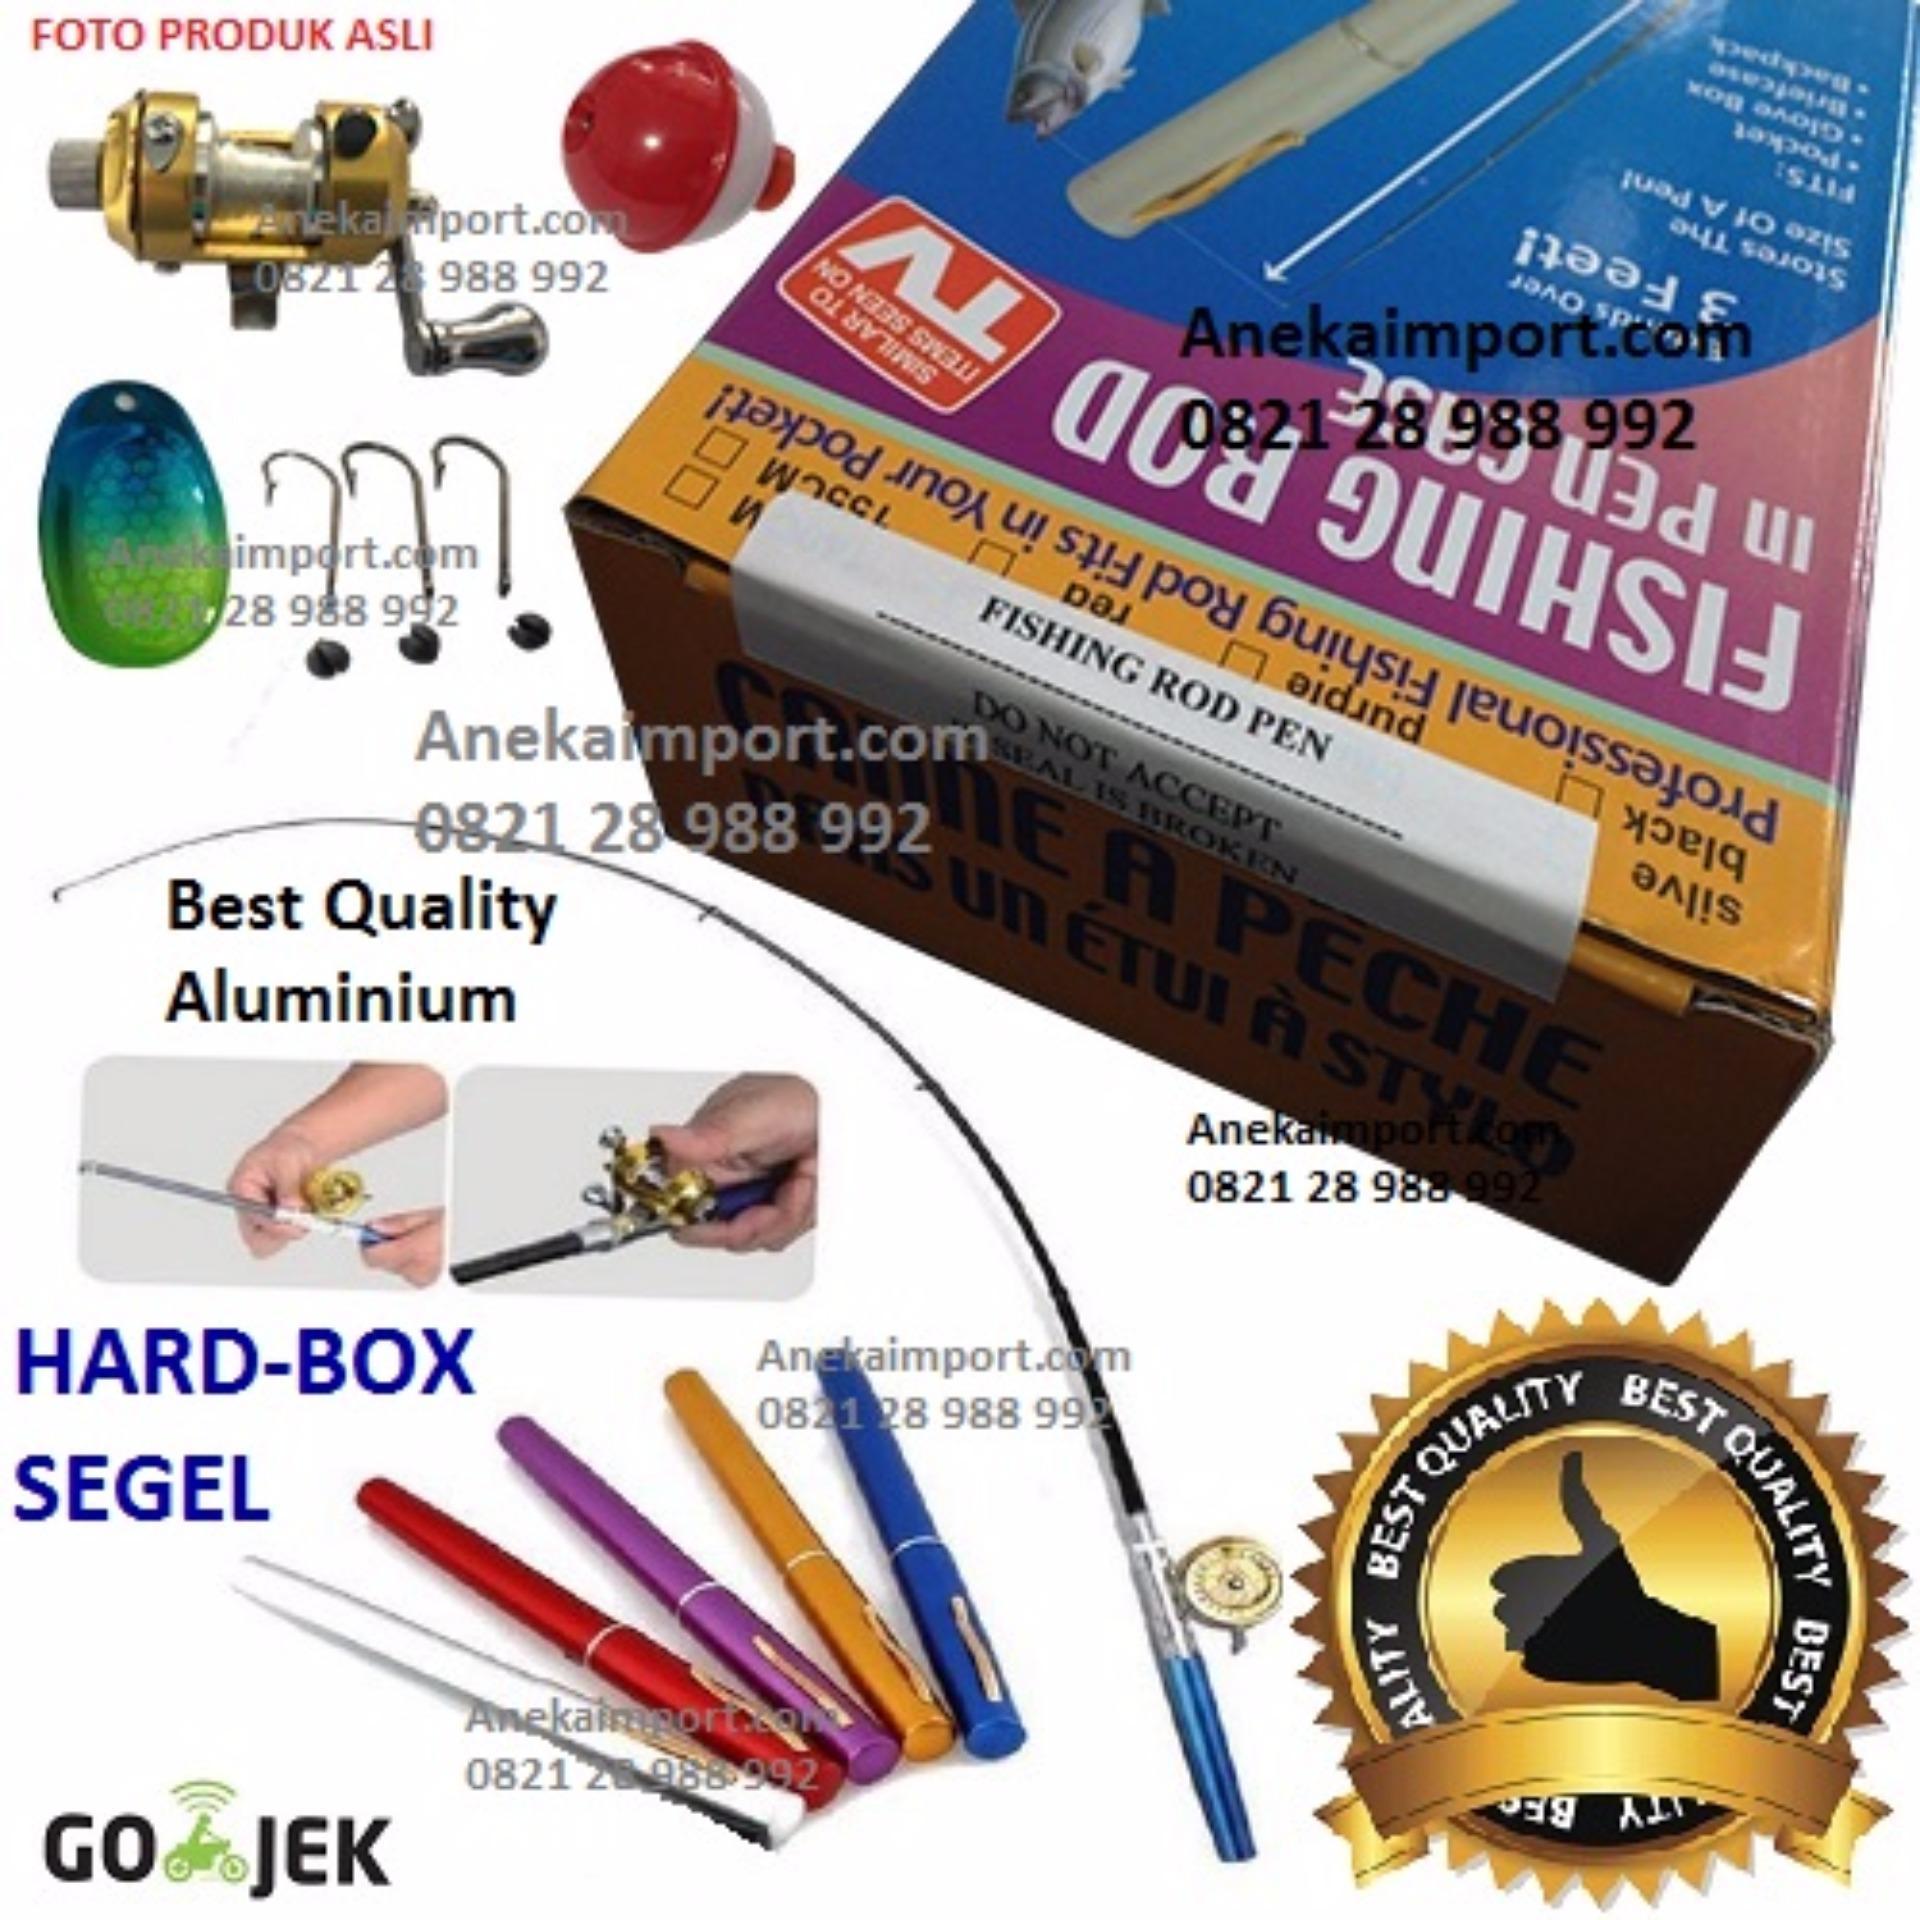 Anekaimportdotcom Alat Pancing Pena MINI 1 SET - Fishing Rod In Pen Case .